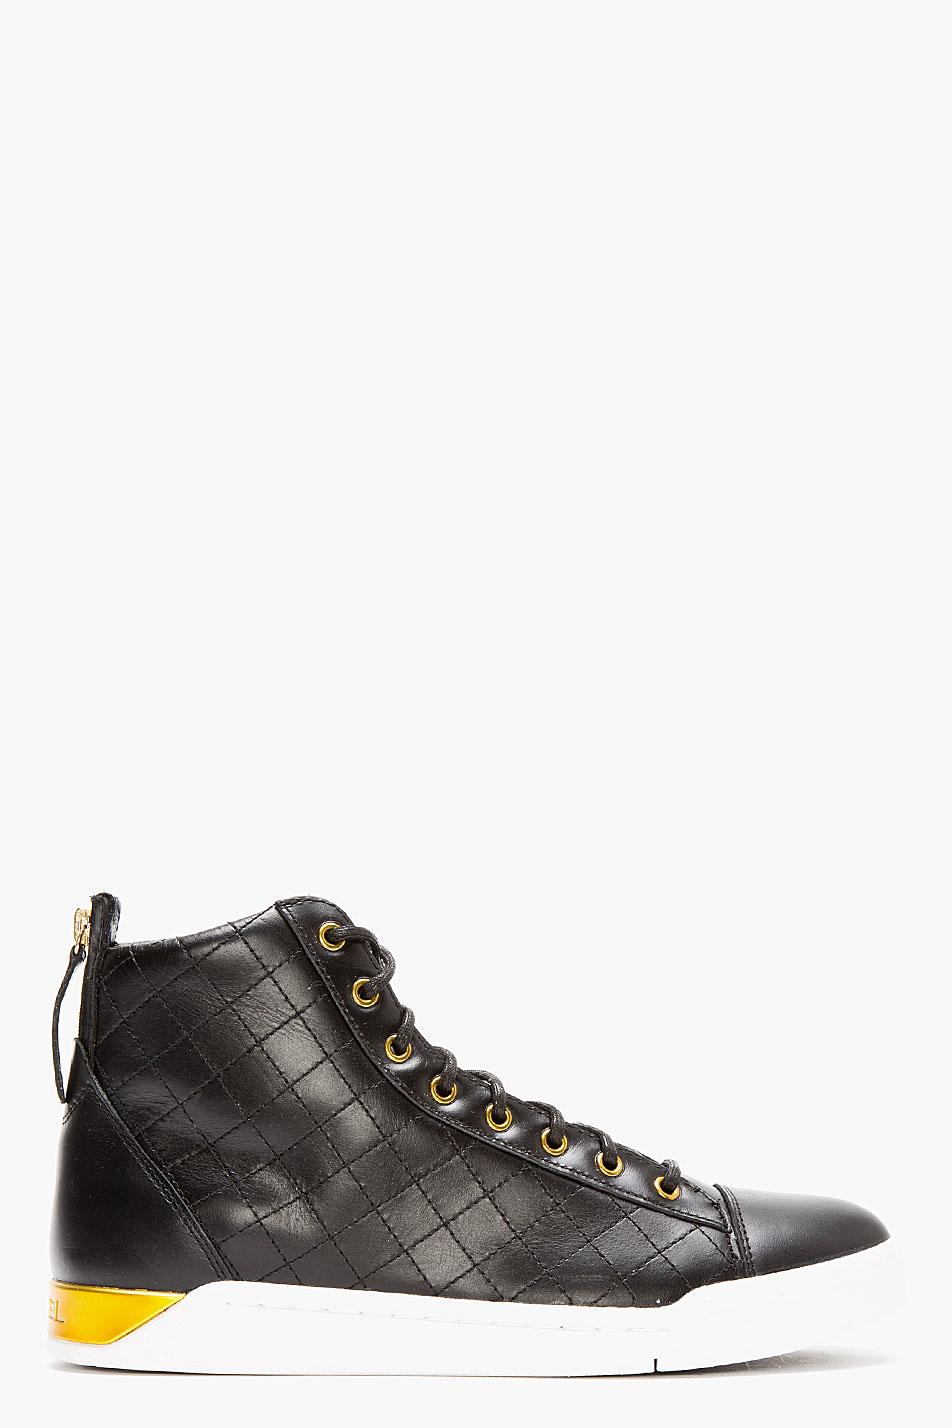 Lyst Diesel Black Quilted Leather Diamond Sneakers In